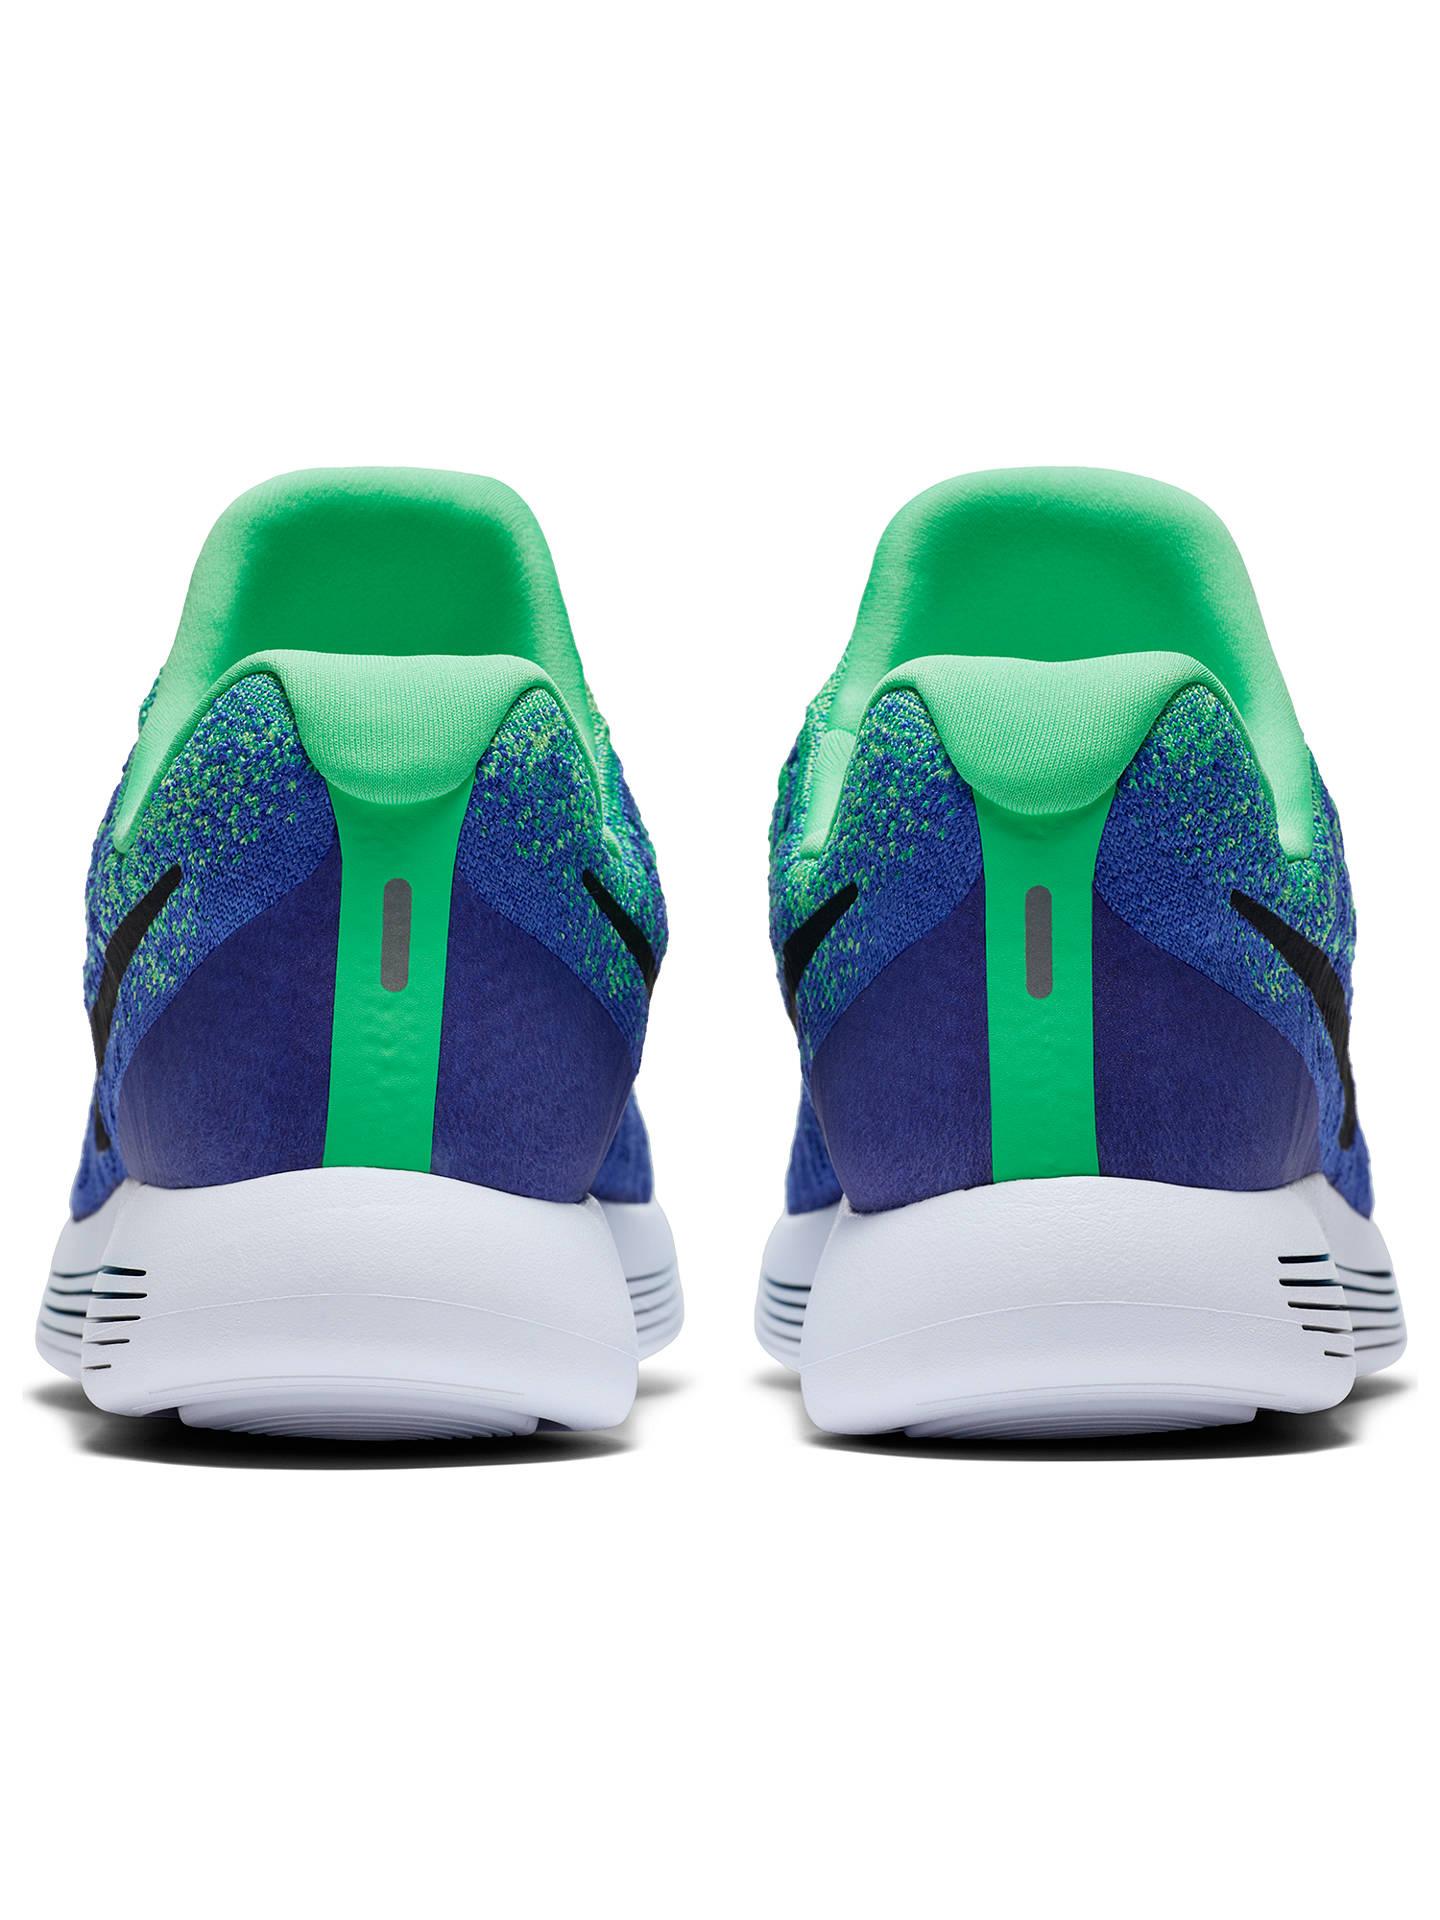 reputable site 1a62c 08cd8 Nike LunarEpic Low Flyknit 2 Men's Running Shoes at John ...